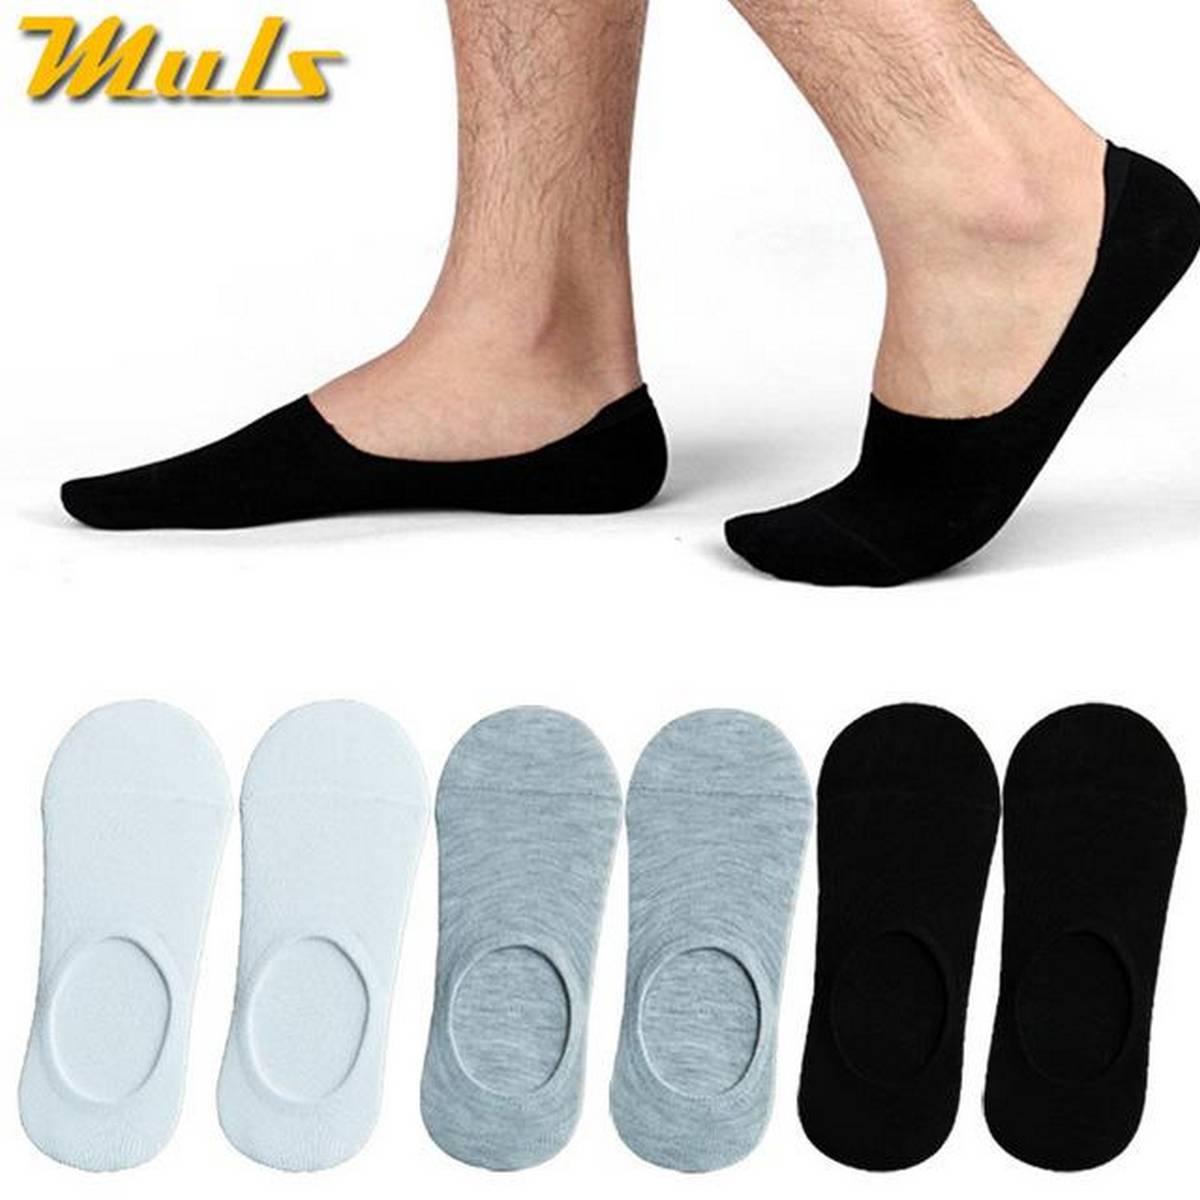 Pack Of 6 Cotton No Show Socks / Loafer Socks For Men